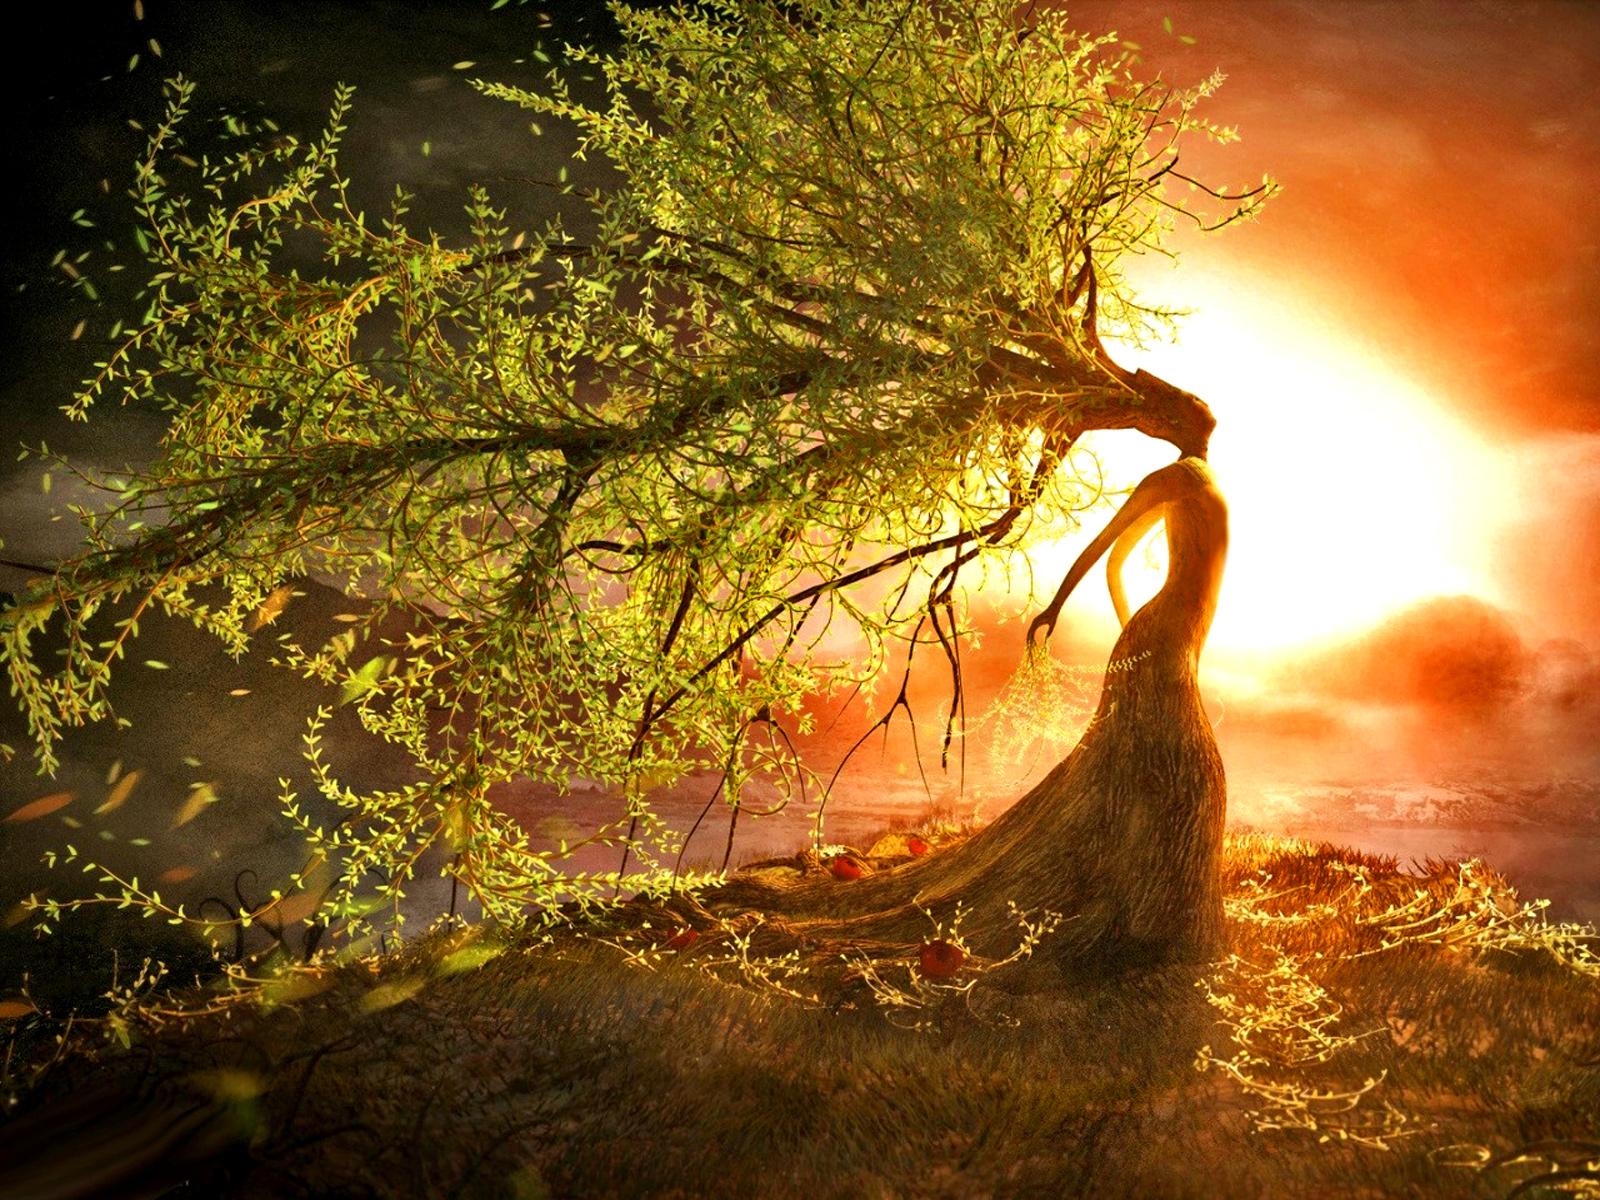 Goddess tree3amandaleighfFemale energy4Spiritual abuse